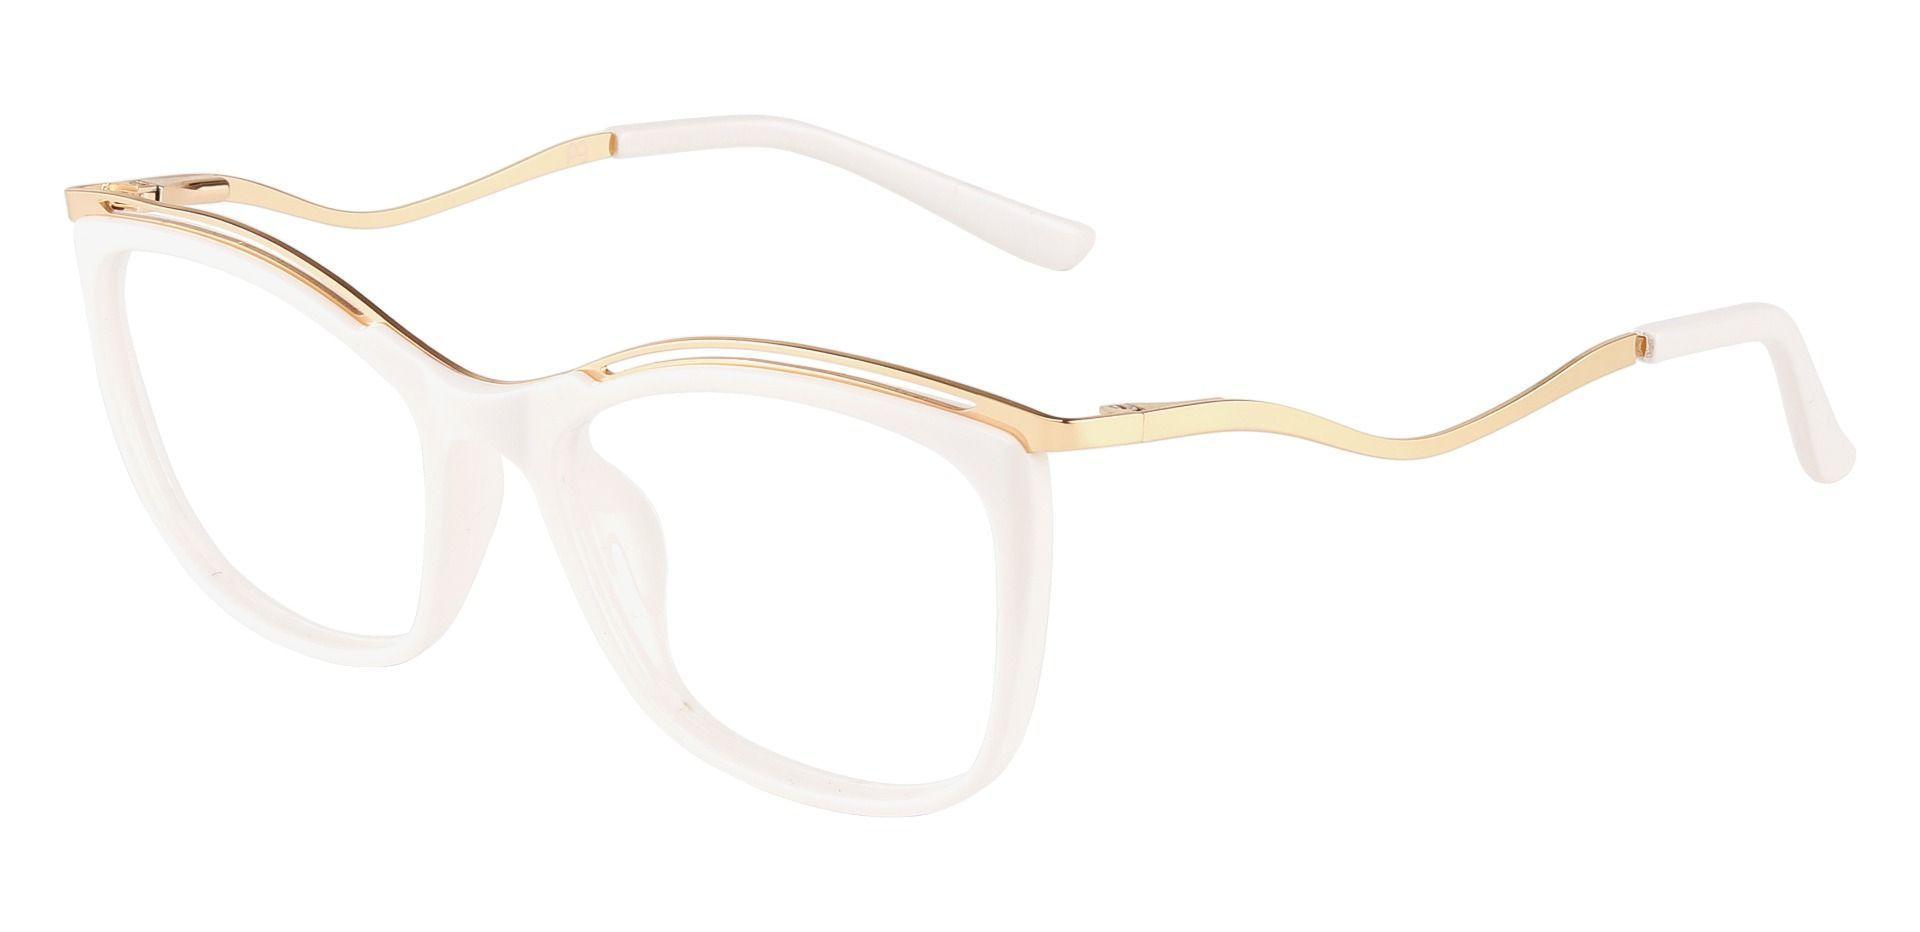 Enola Cat Eye Prescription Glasses - White